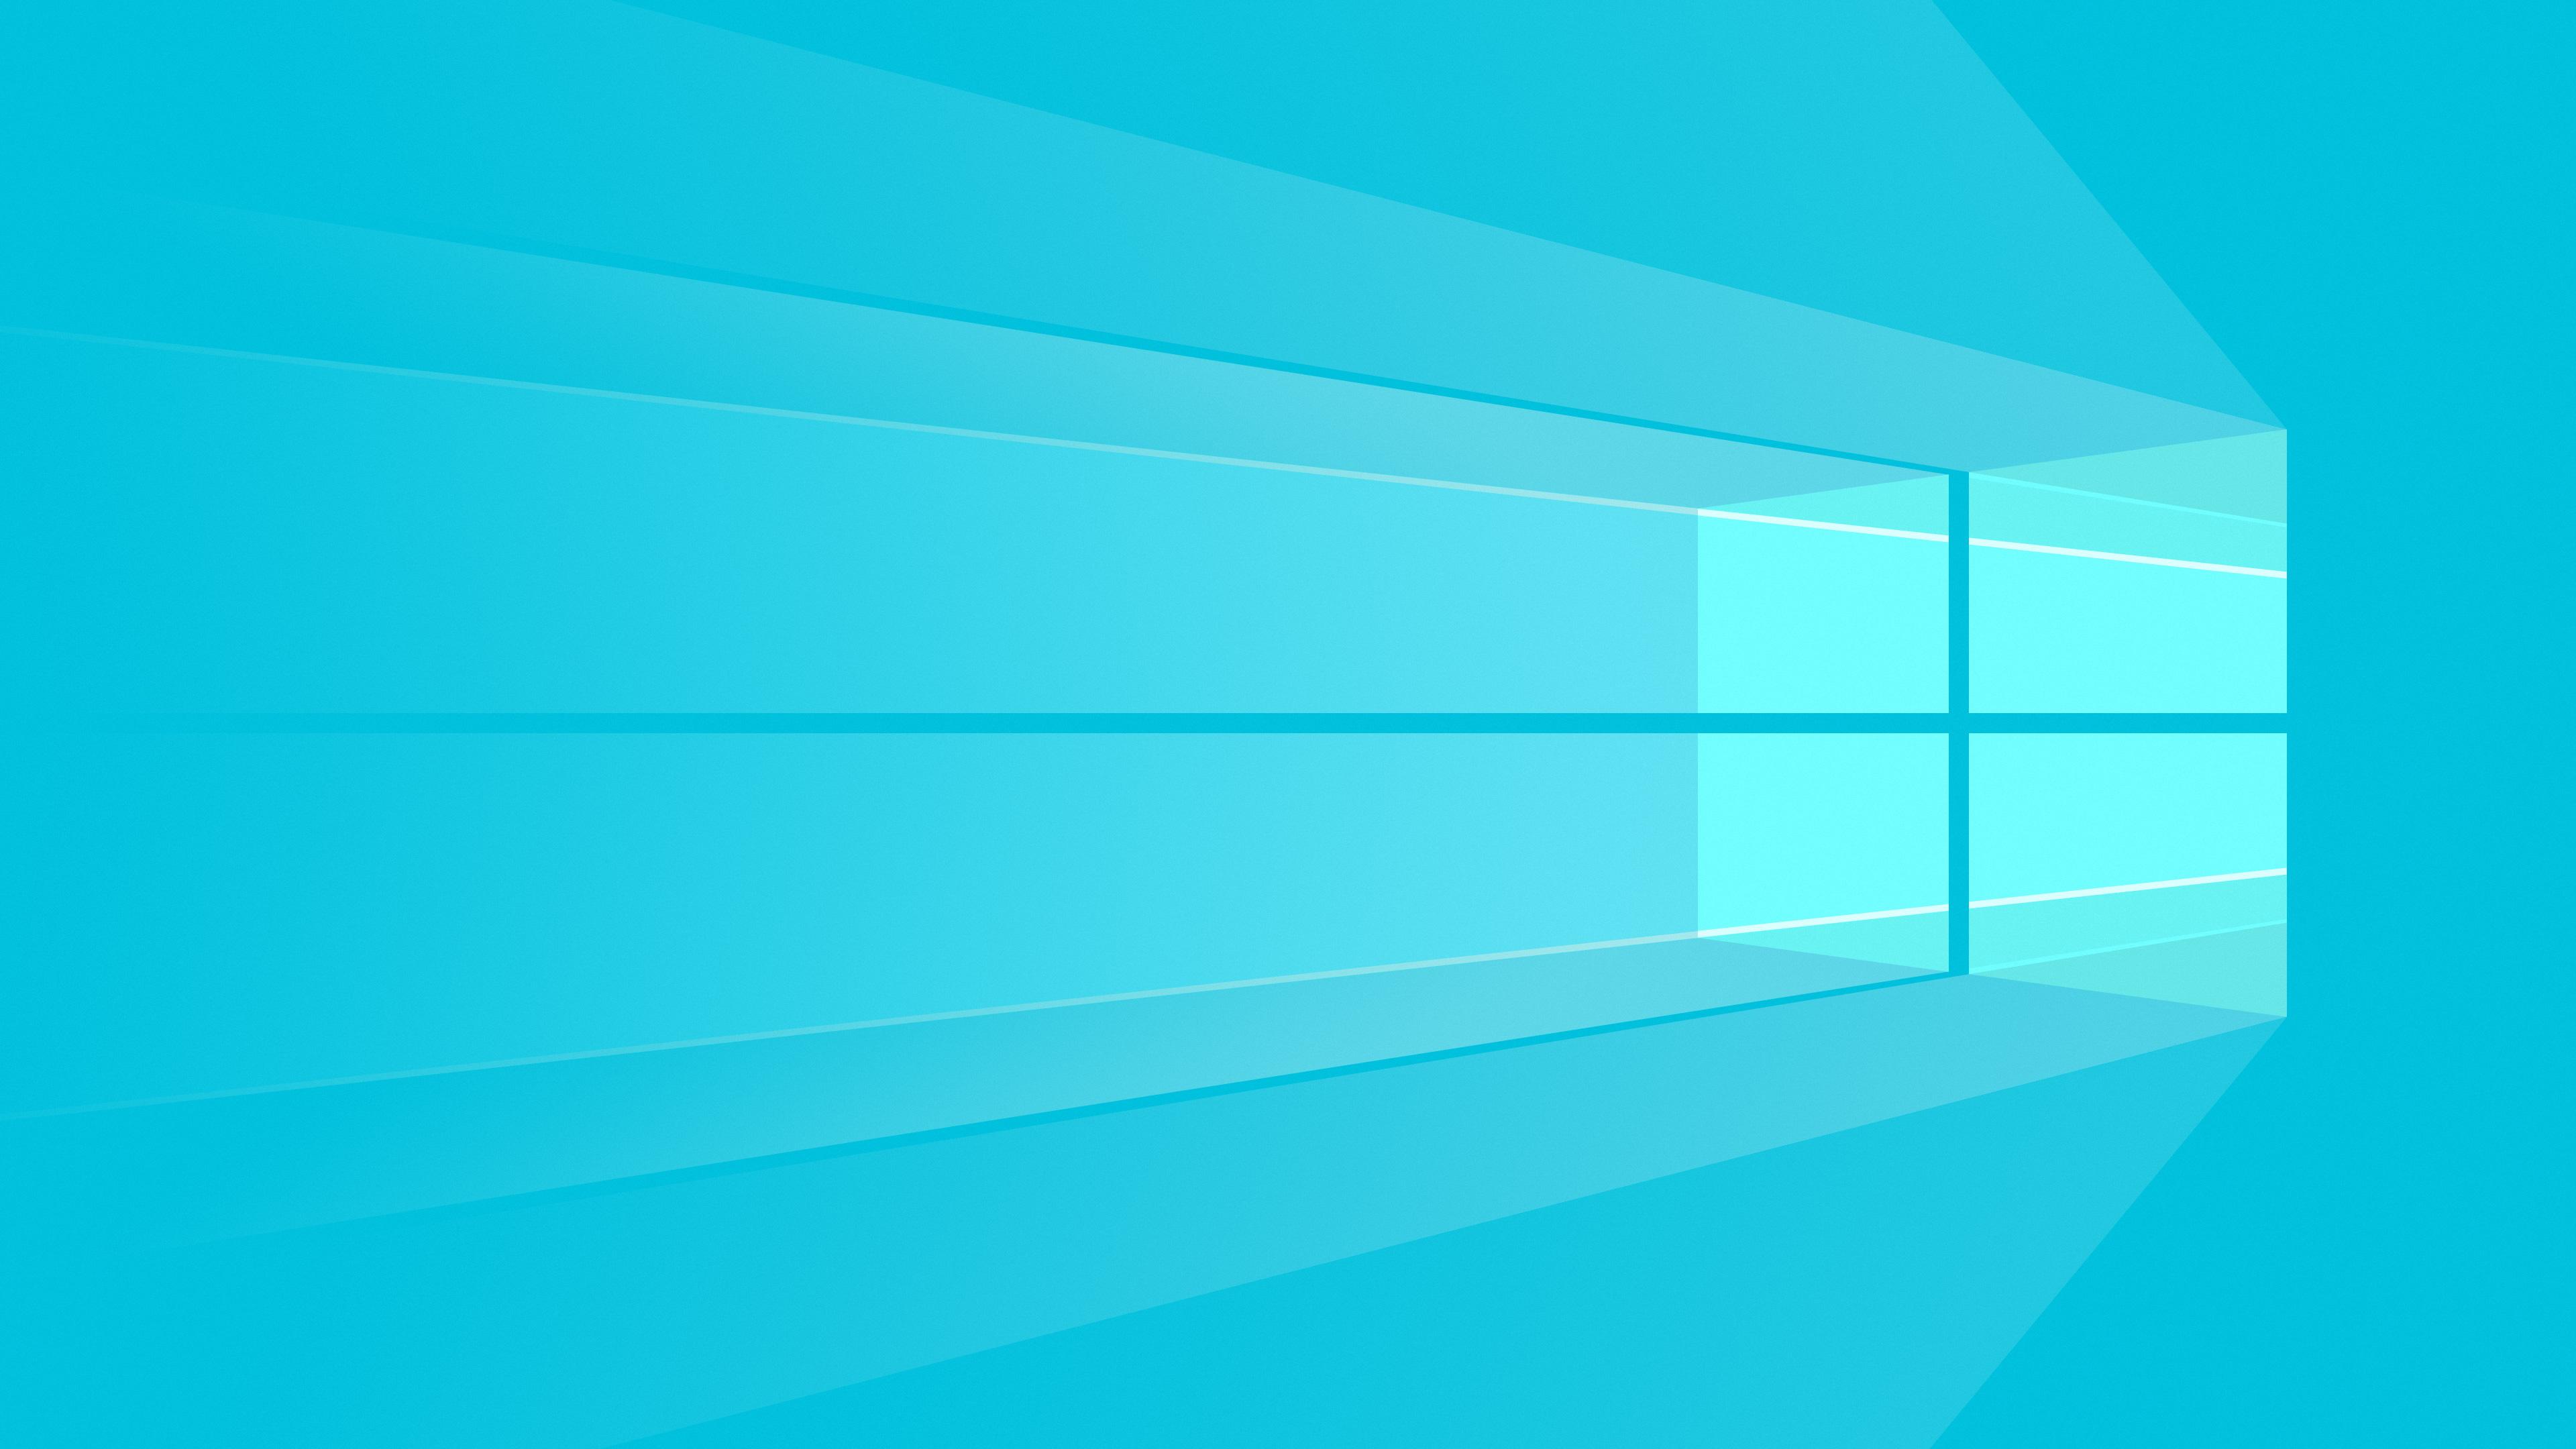 Windows 10 Minimalist 4k Hd Computer 4k Wallpapers Images